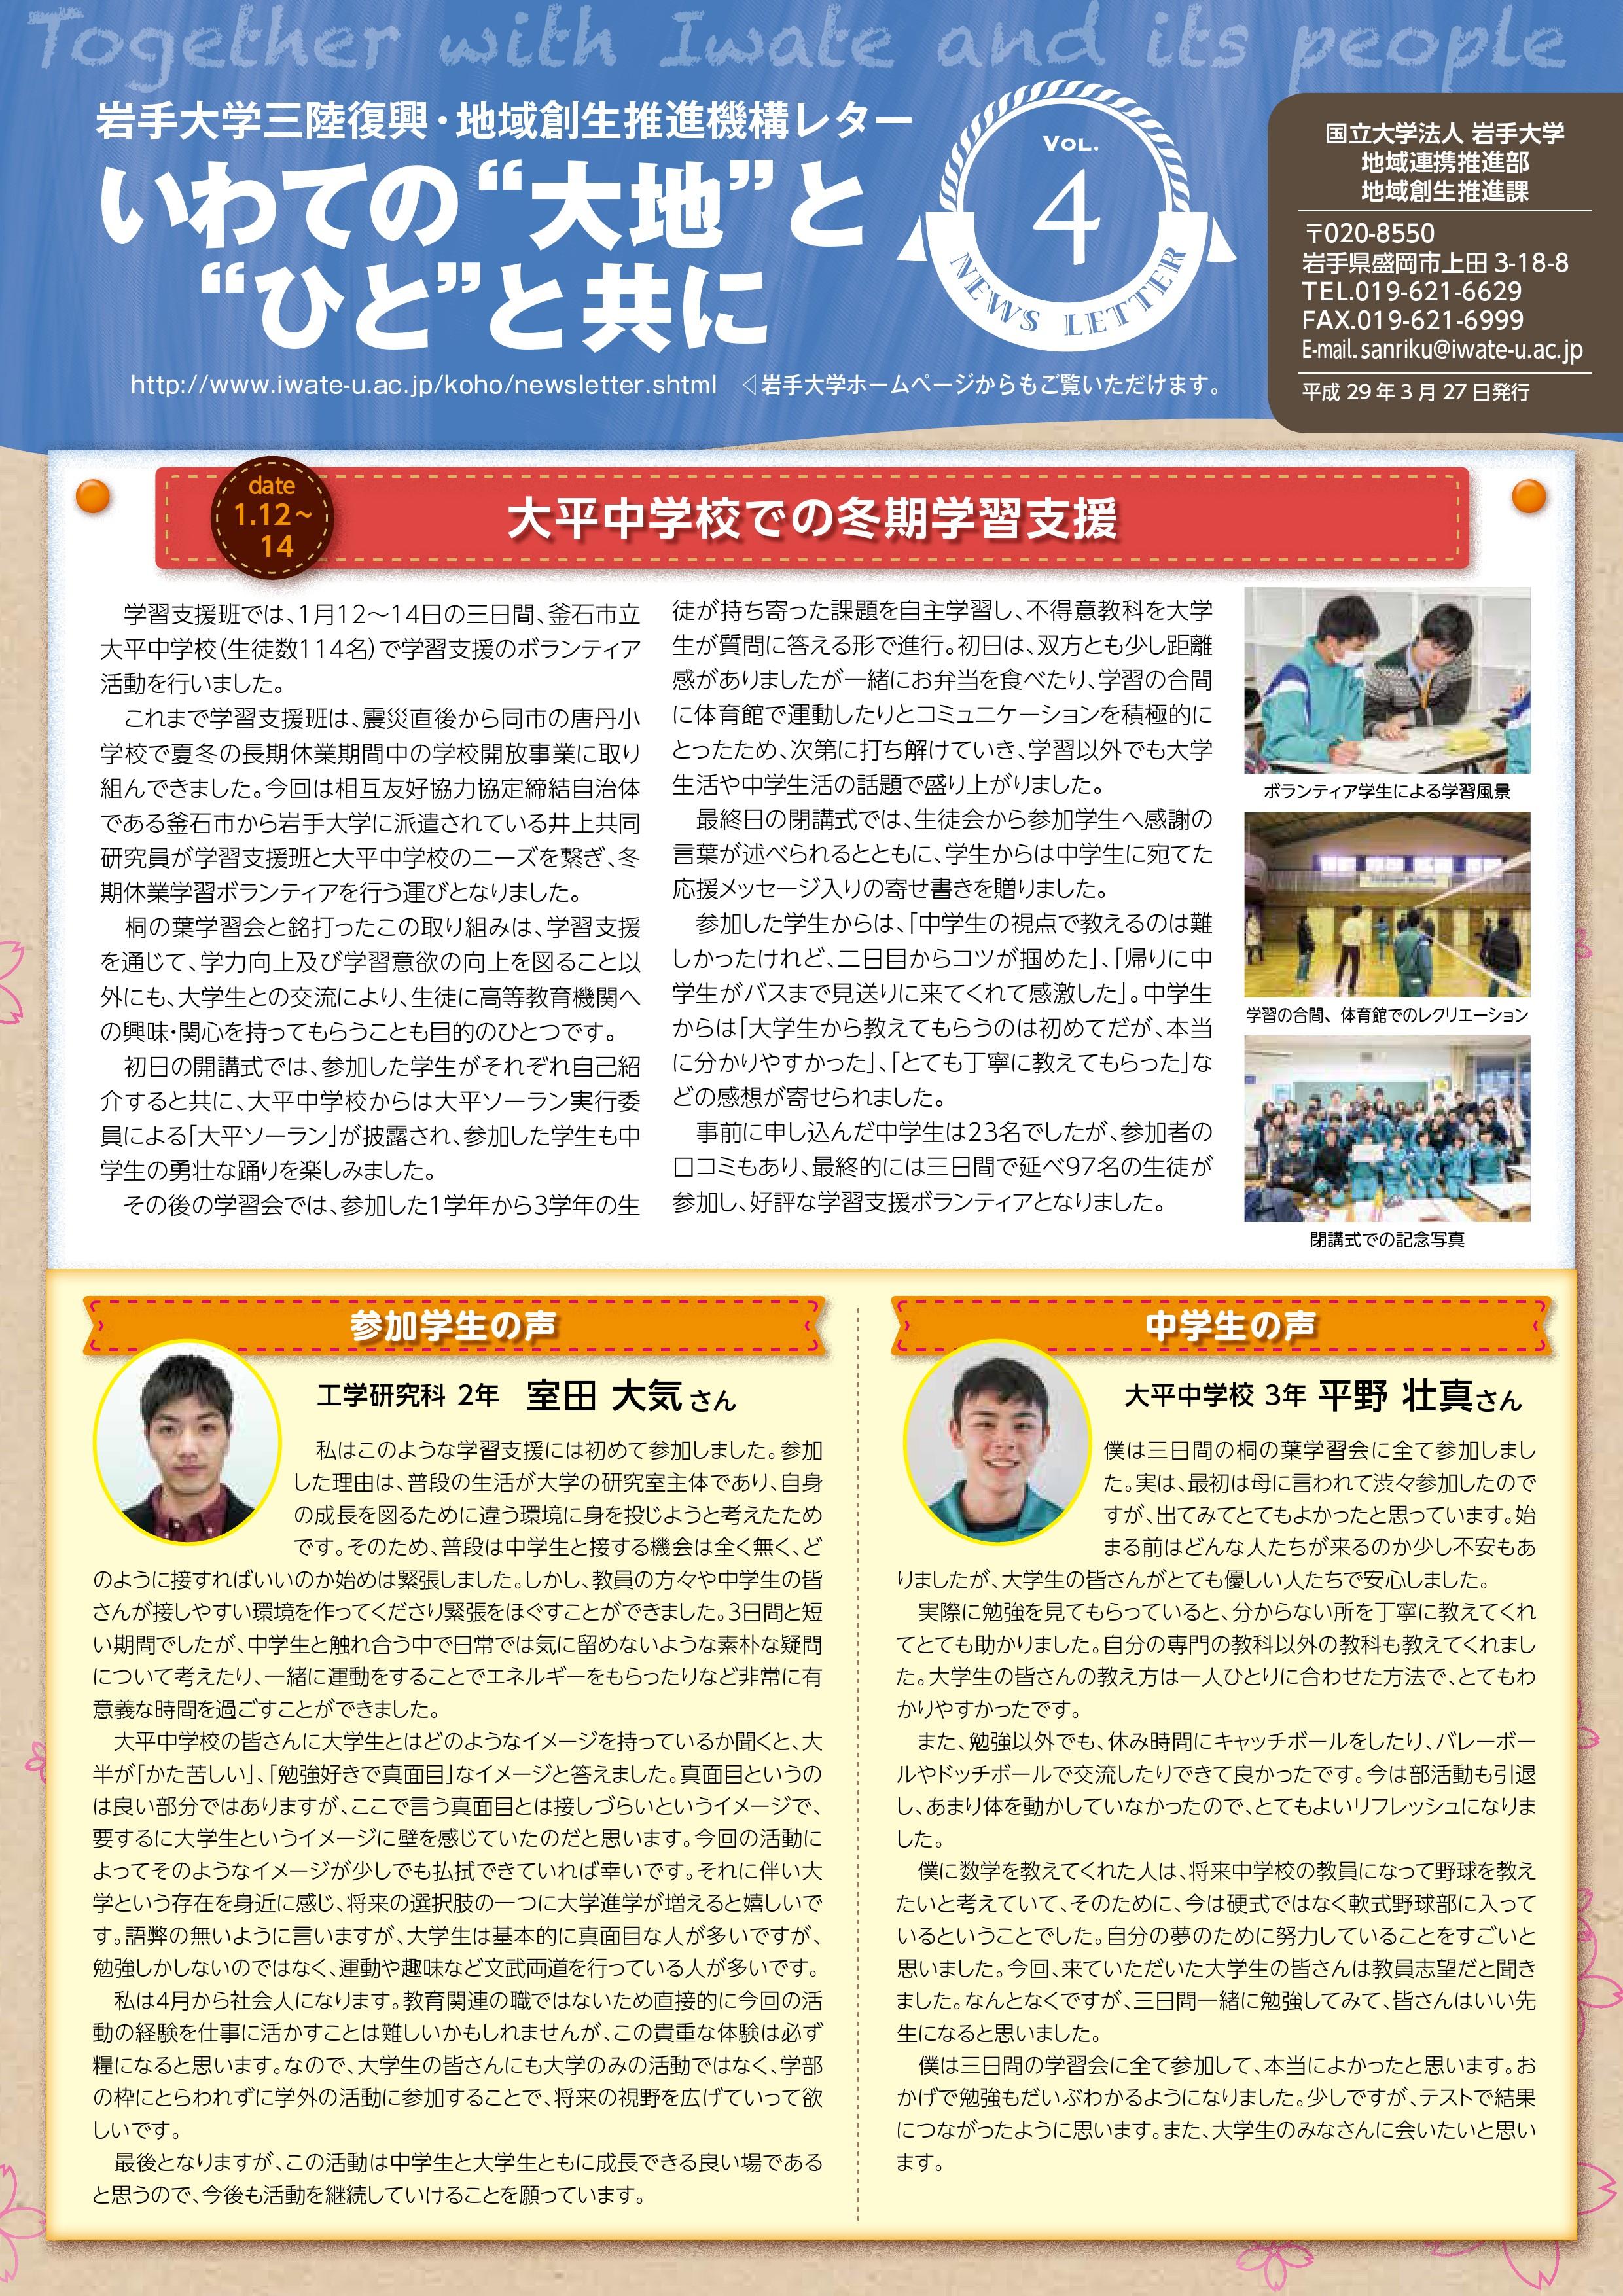 Vol.4 大平中学校での冬期学習支援